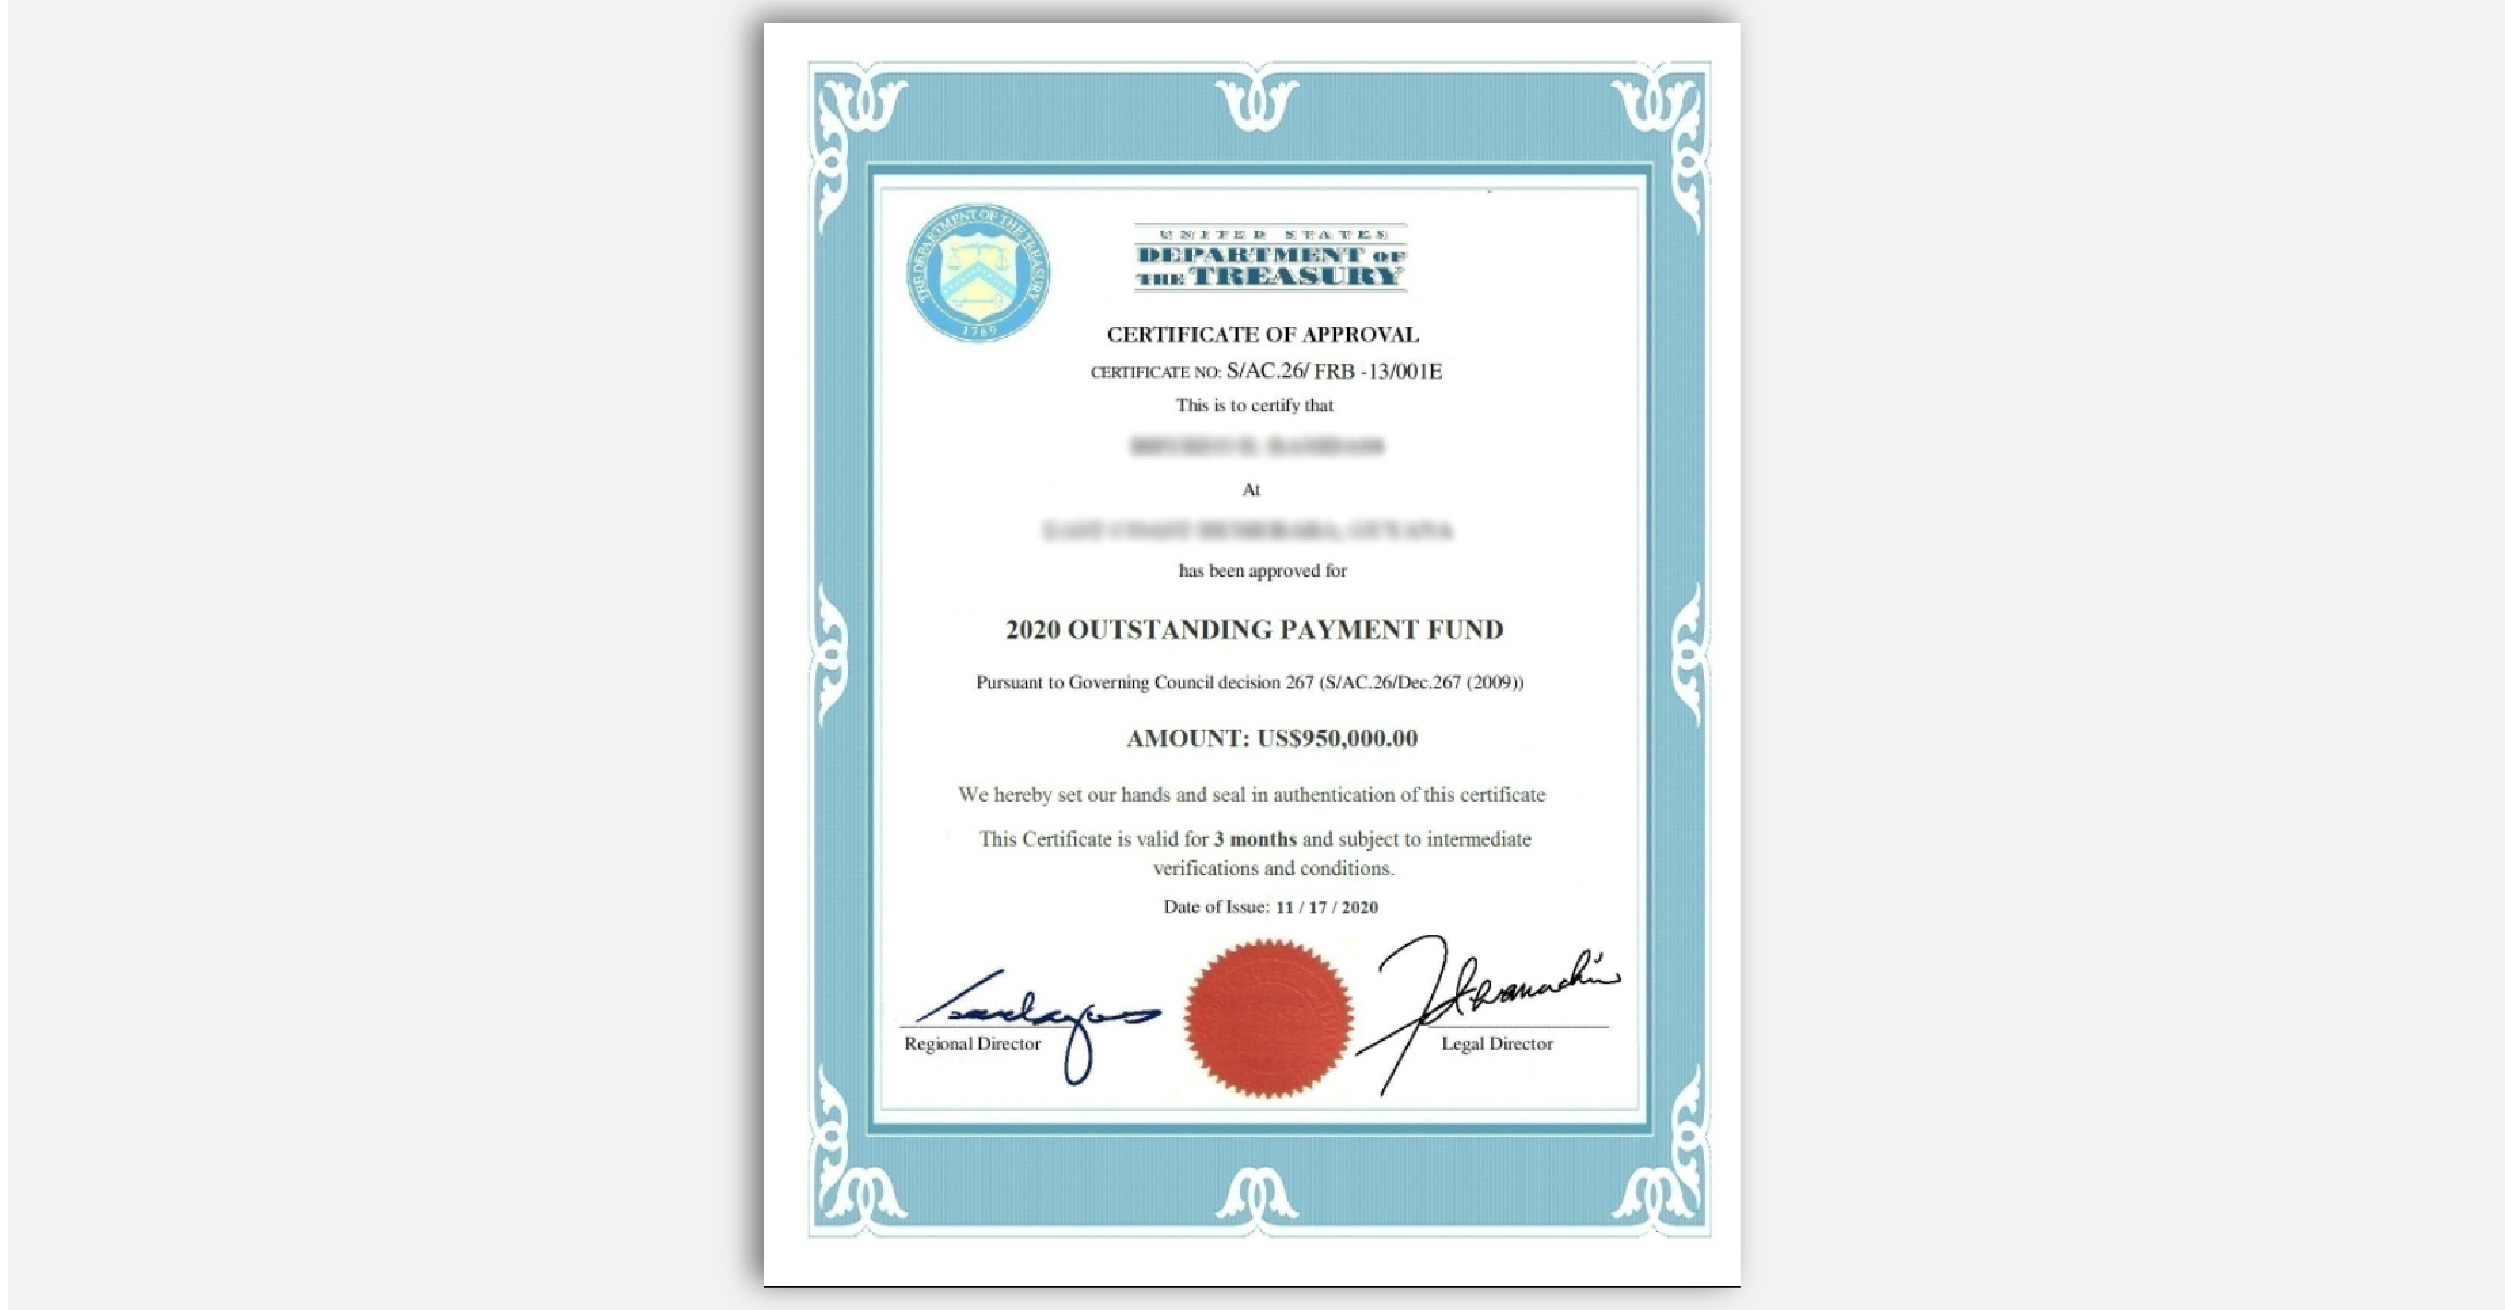 FTC_impersonator_certificate